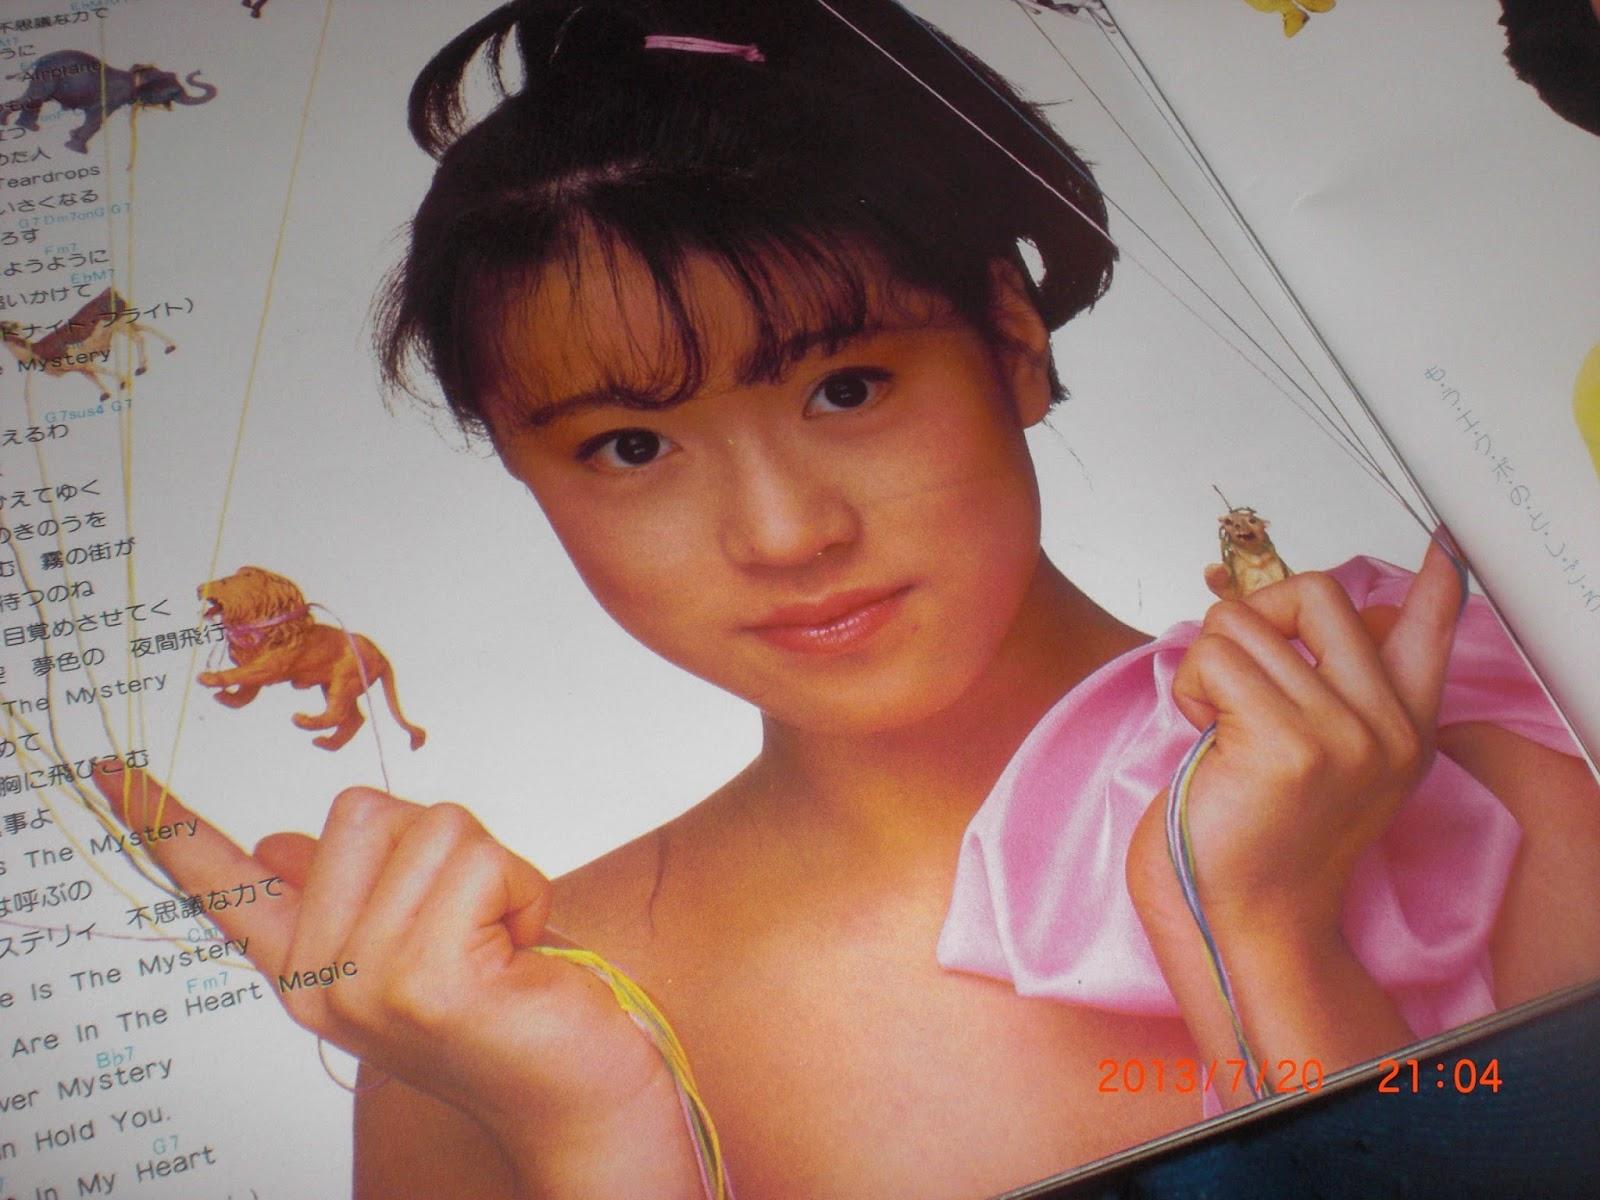 Natsume Sano (b. 1985) nude photos 2019